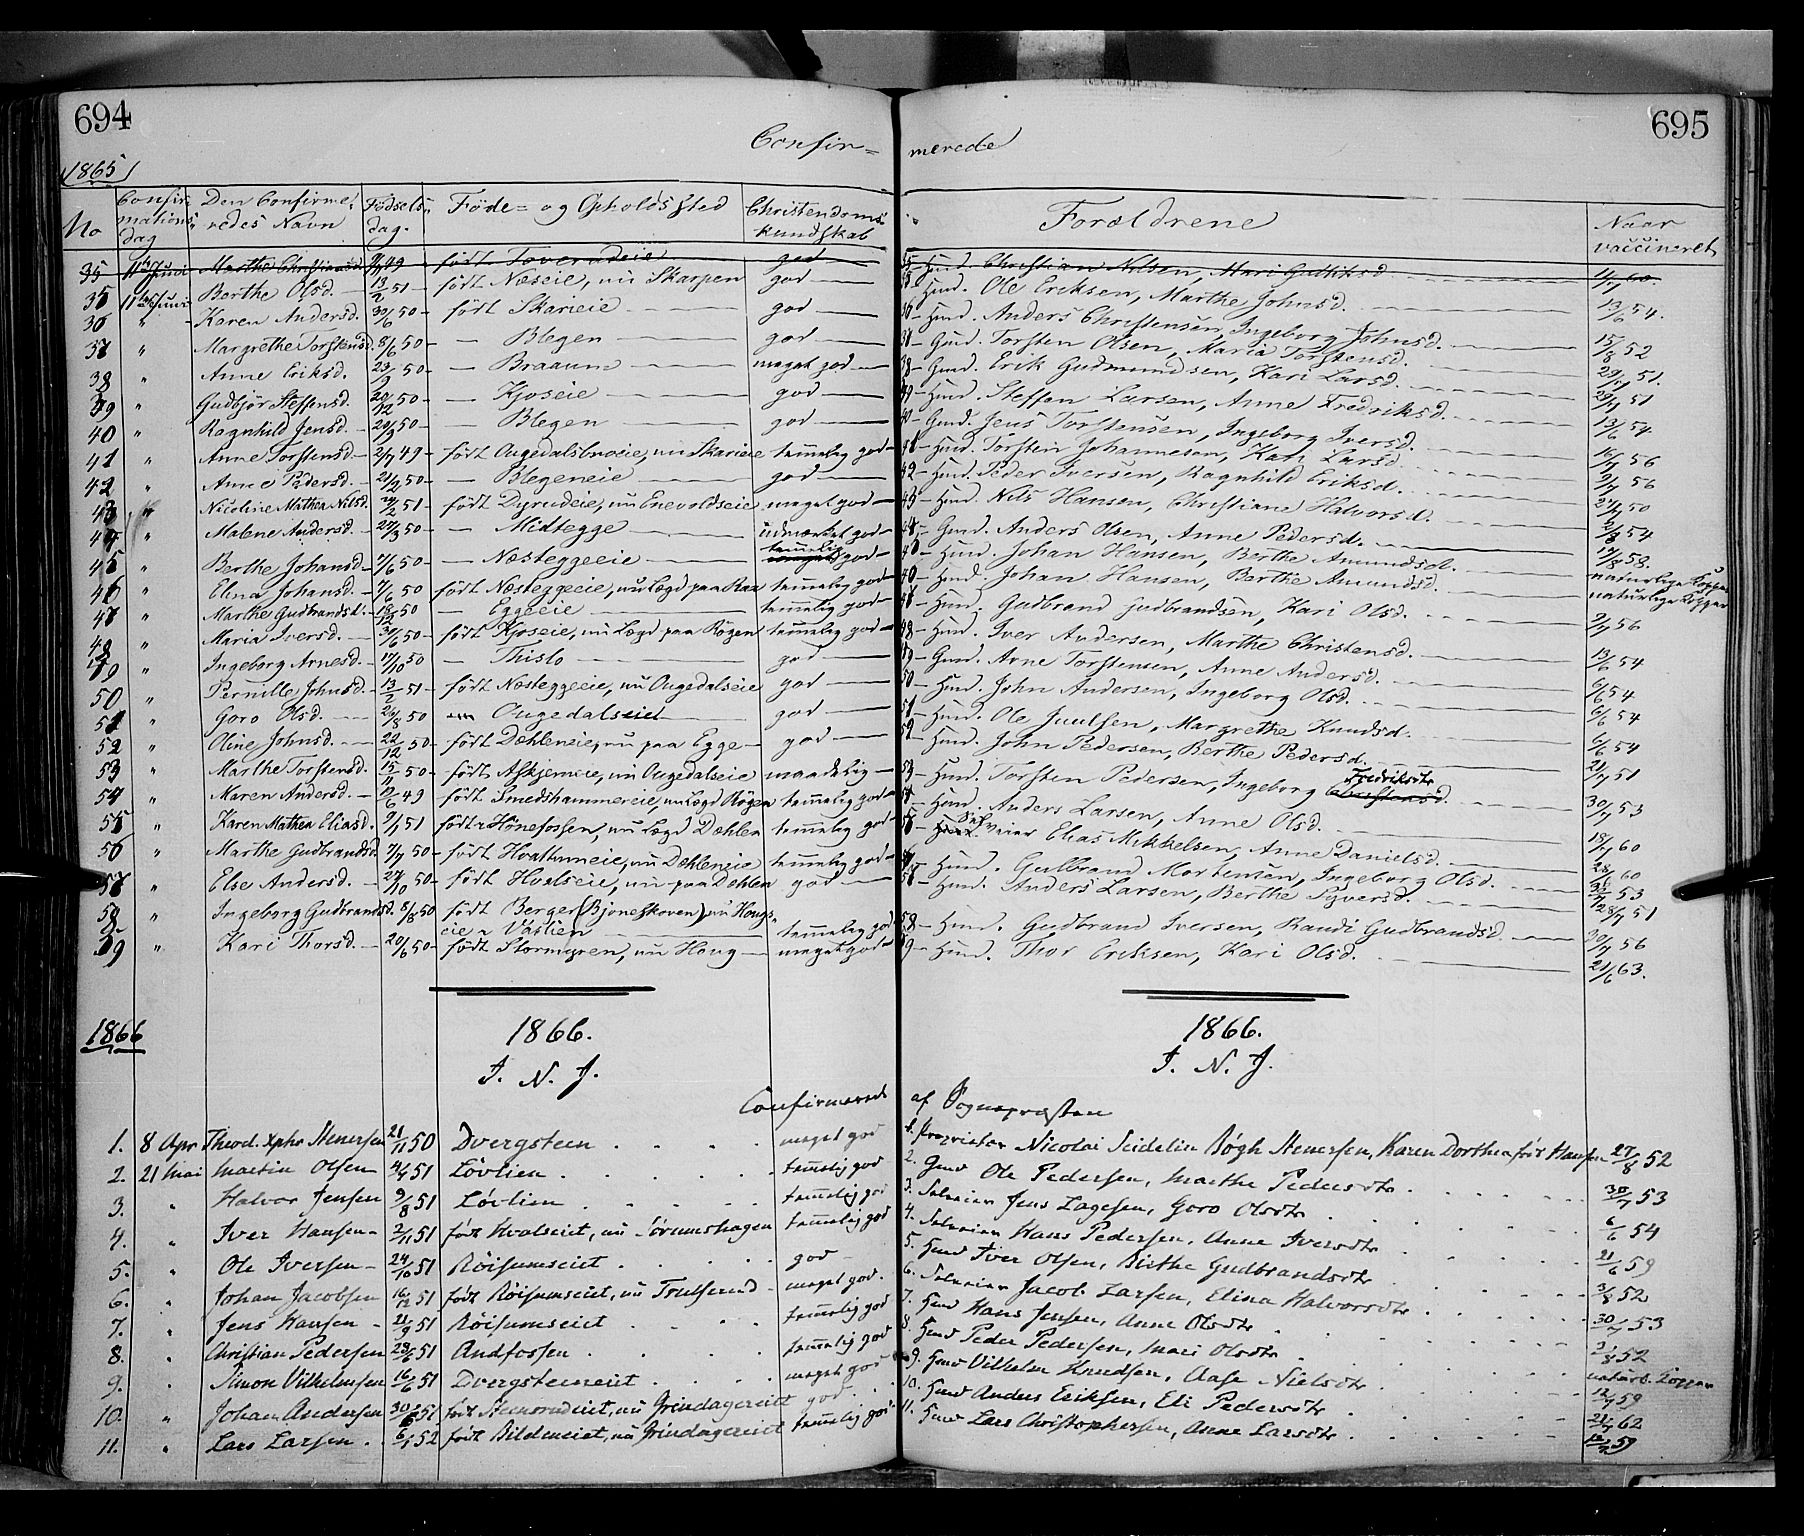 SAH, Gran prestekontor, Ministerialbok nr. 12, 1856-1874, s. 694-695